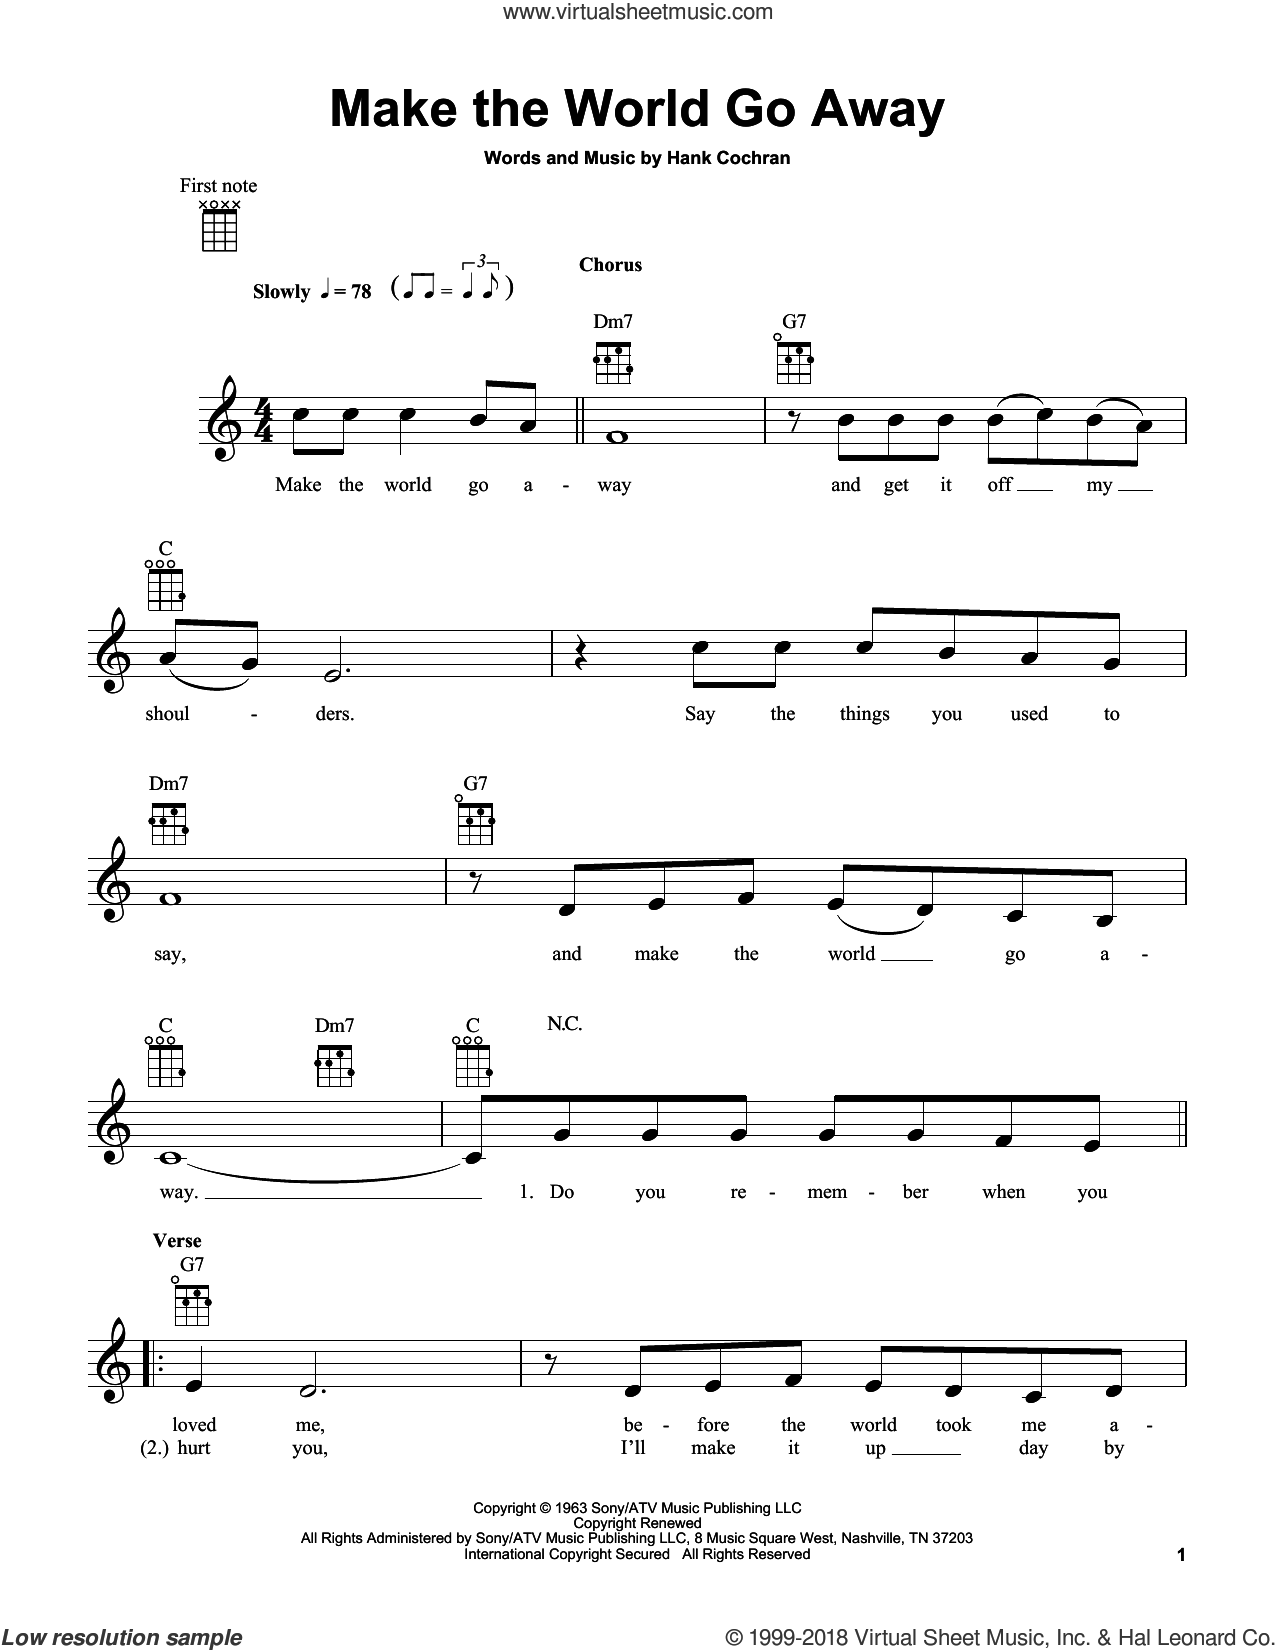 Make The World Go Away sheet music for ukulele by Eddy Arnold, Elvis Presley and Hank Cochran, intermediate skill level